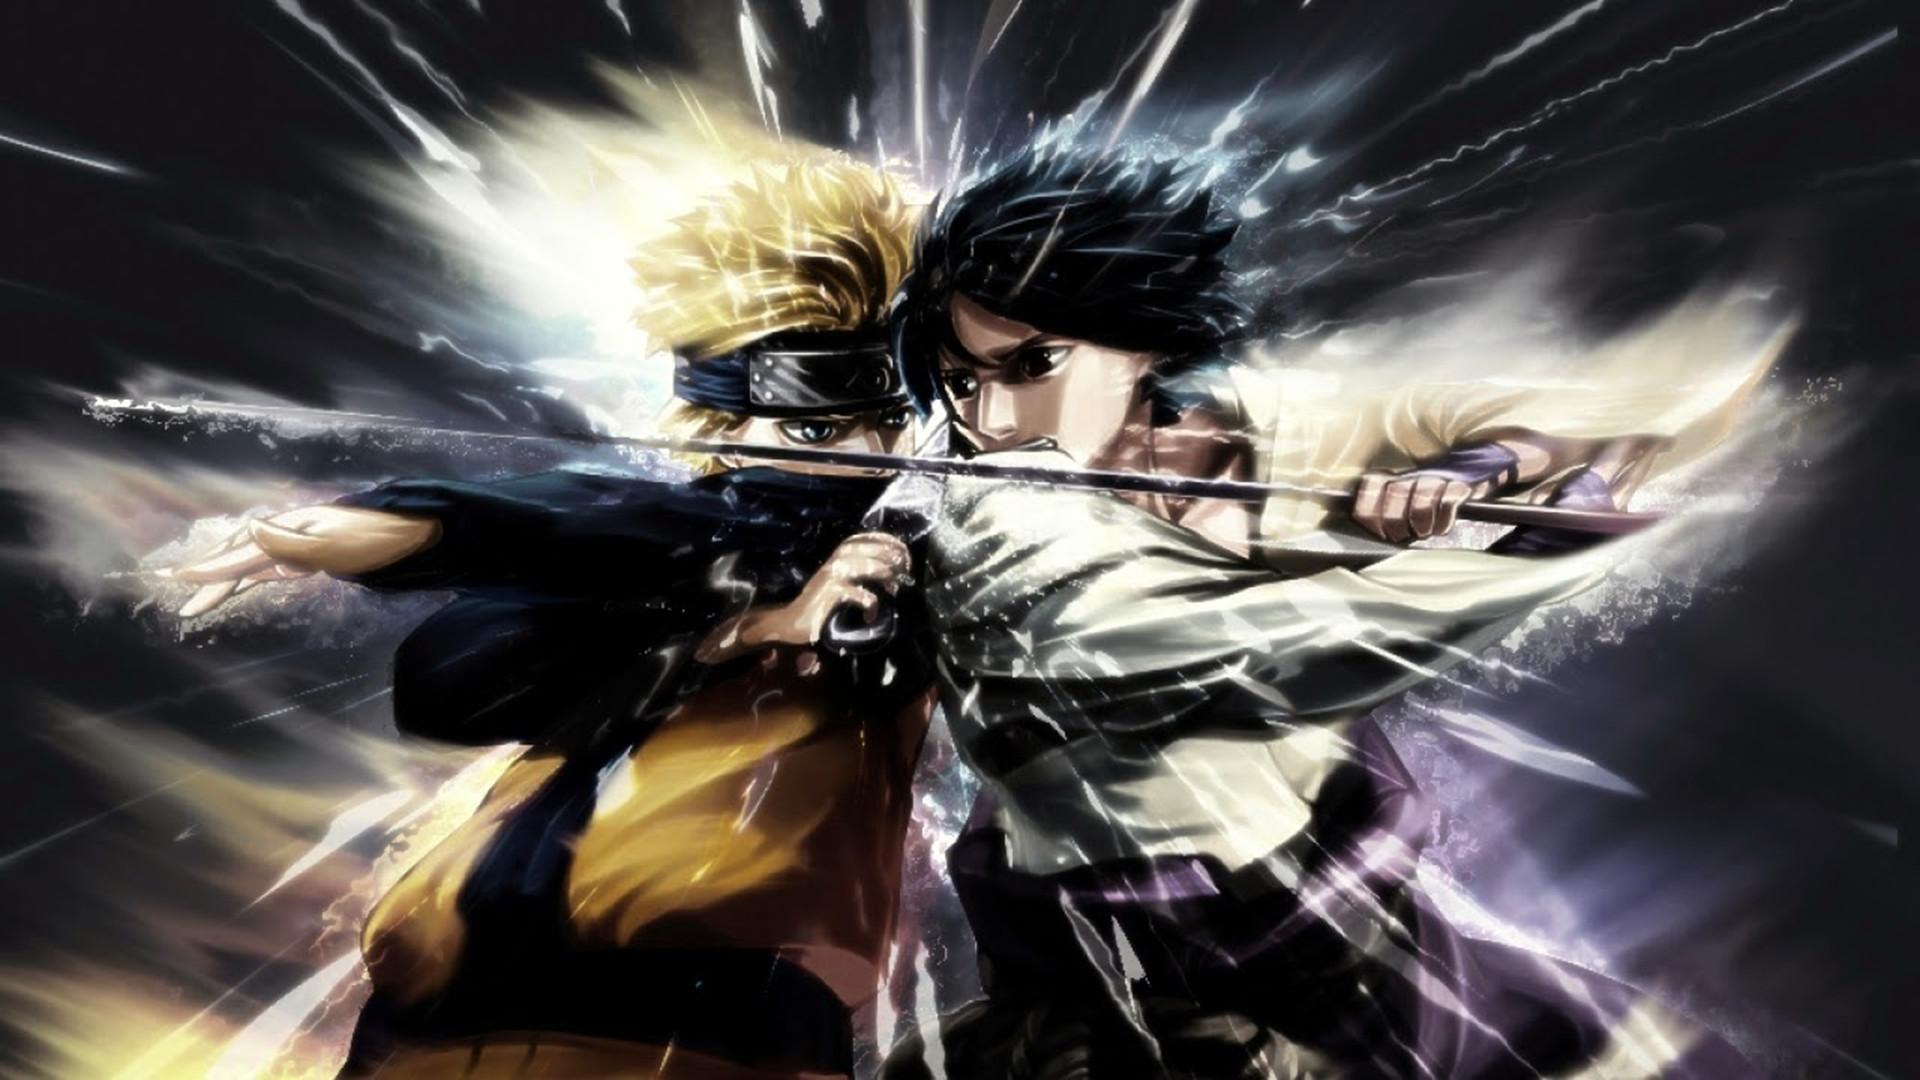 146 sasuke wallpaper hd